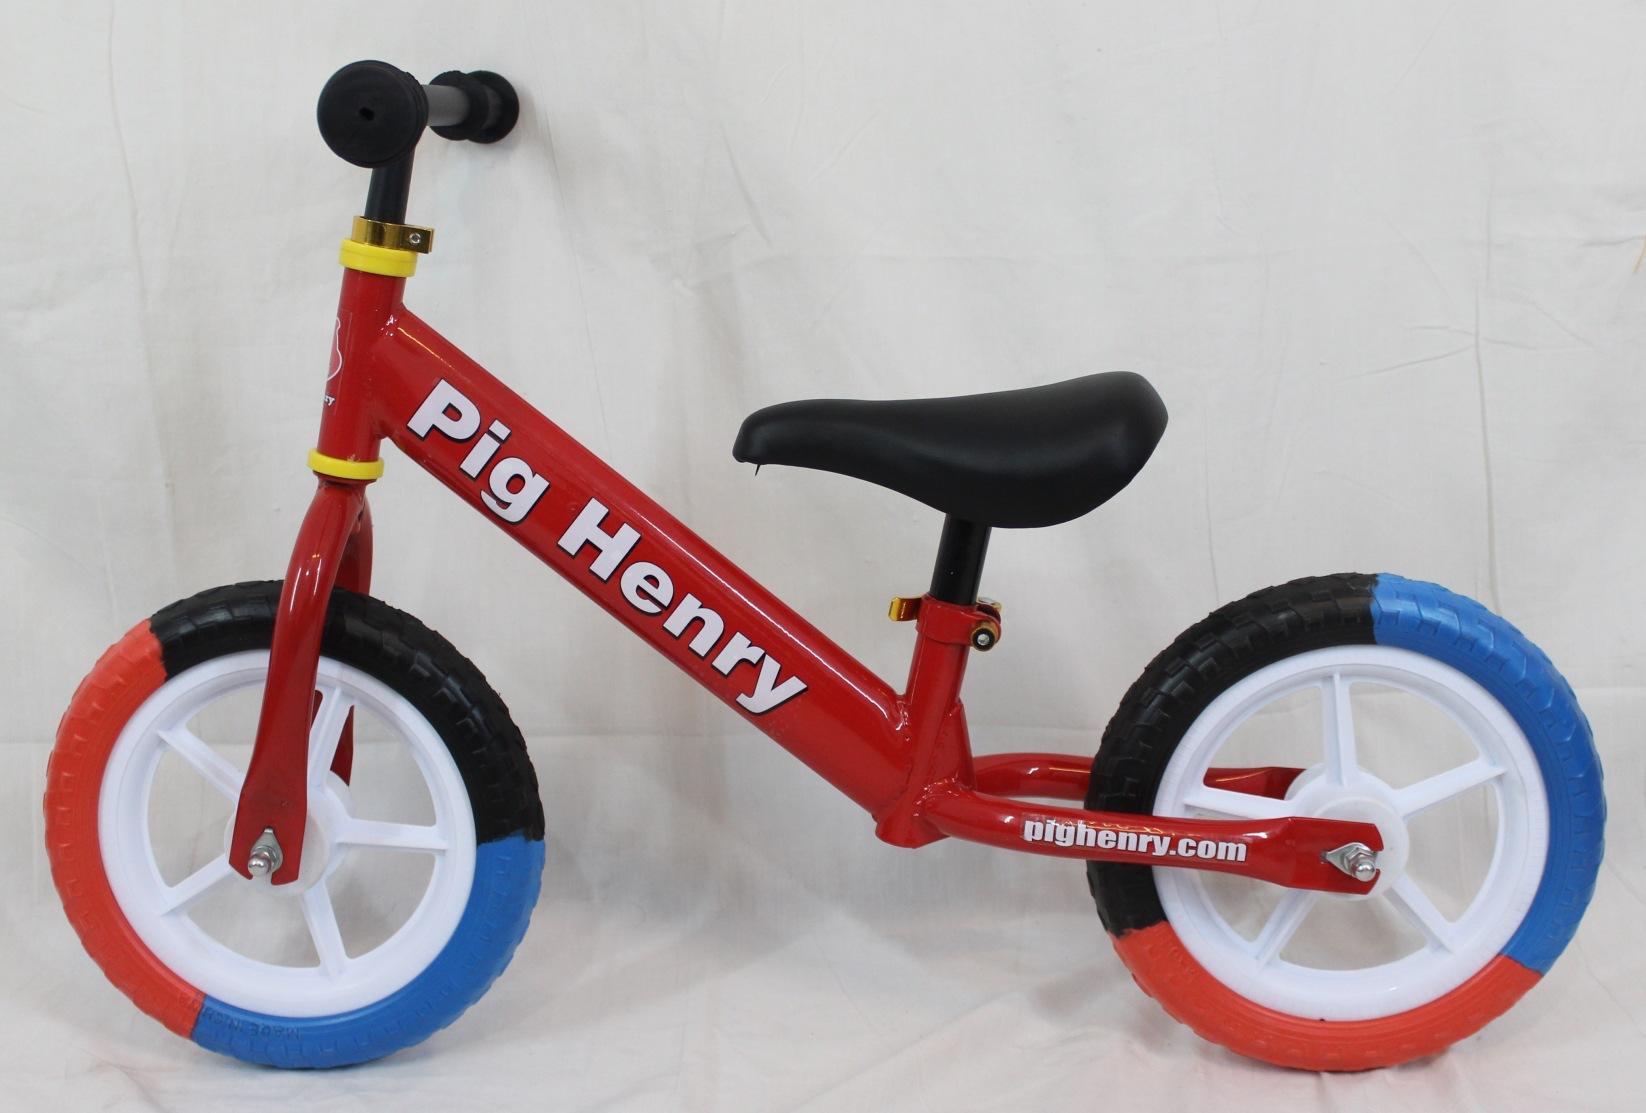 Pushbike clipart double Single Popular Bike Bike Baby